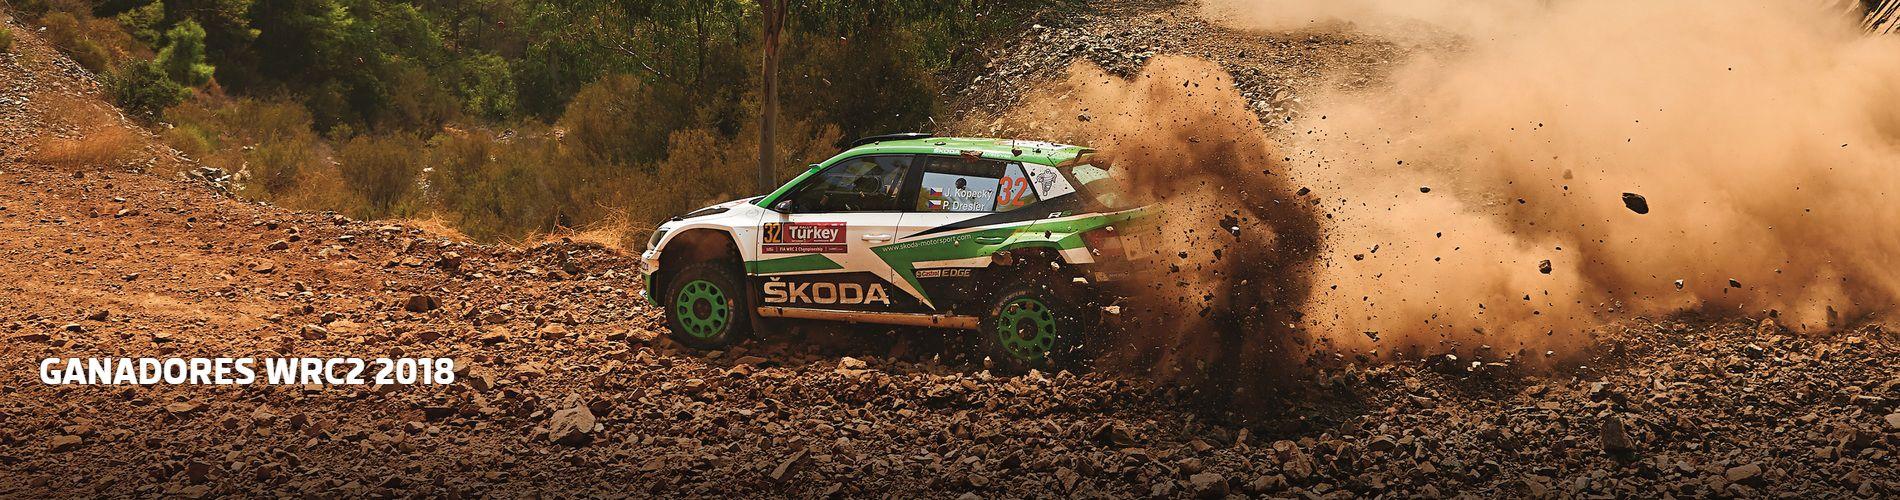 GANADORES WRC2 2018